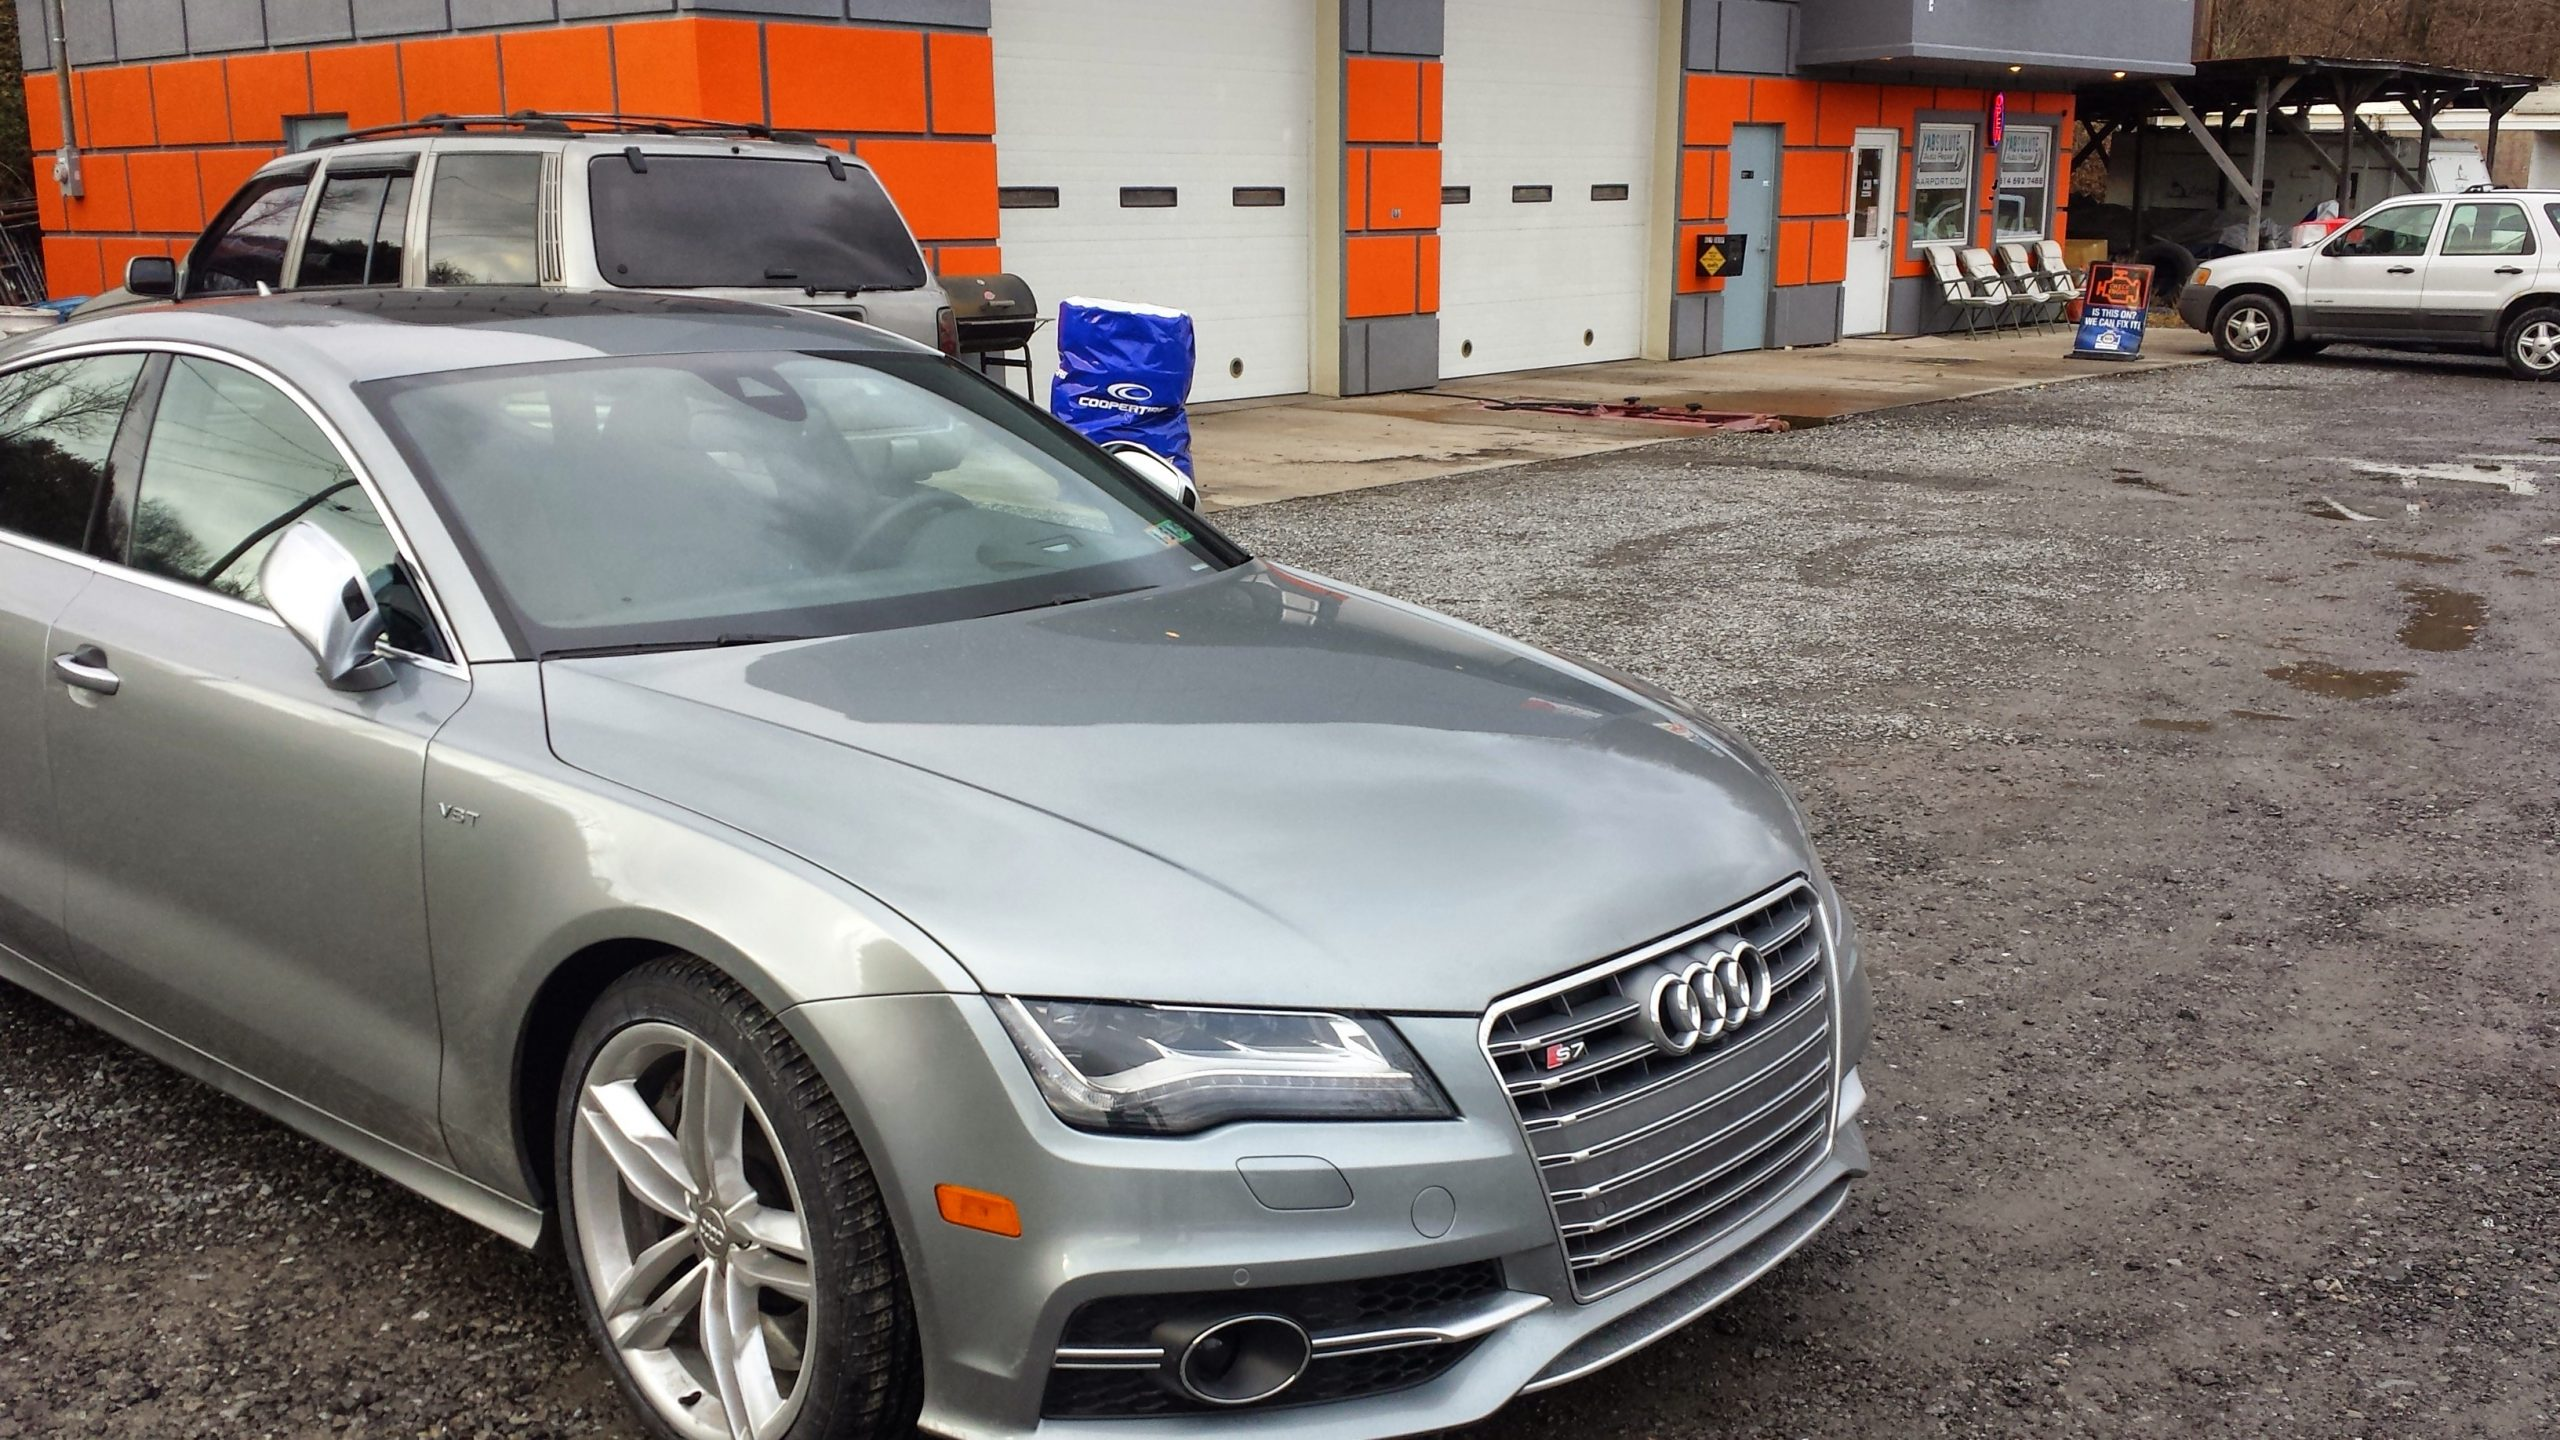 Audi A2, Audi A3, Audi S3, Audi A4, Audi S4, Audi RS4, Audi A4 allroad quattro, Audi A5, Audi S5, Audi RS5, Audi A6, Audi S6 Audi RS 6, Audi A6 allroad quattro, Audi A7 Audi RS7, Audi S7,